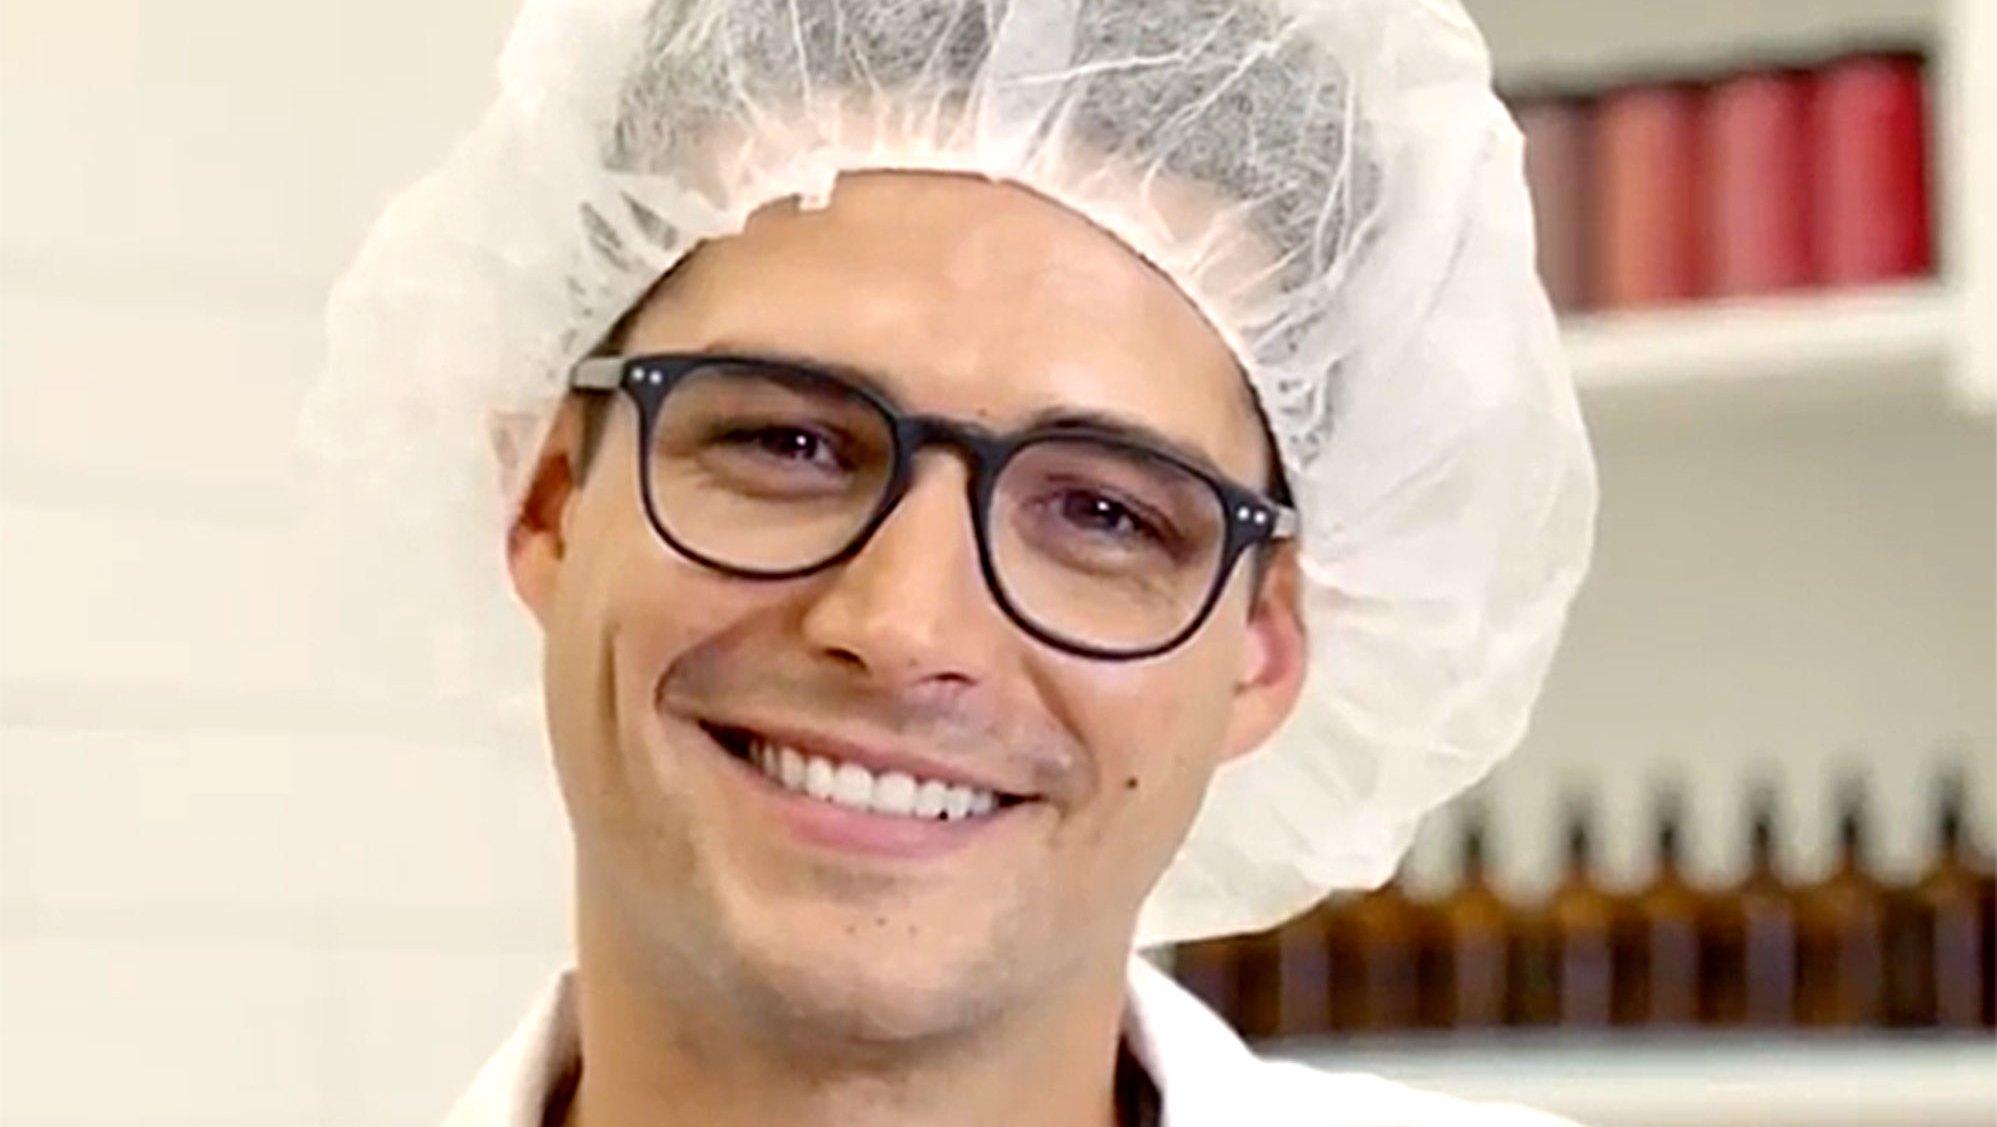 #HotGuysMakingLipstick Friday Treat: Behold Hot Guys Making Lipstick wells adams Steven Perkins